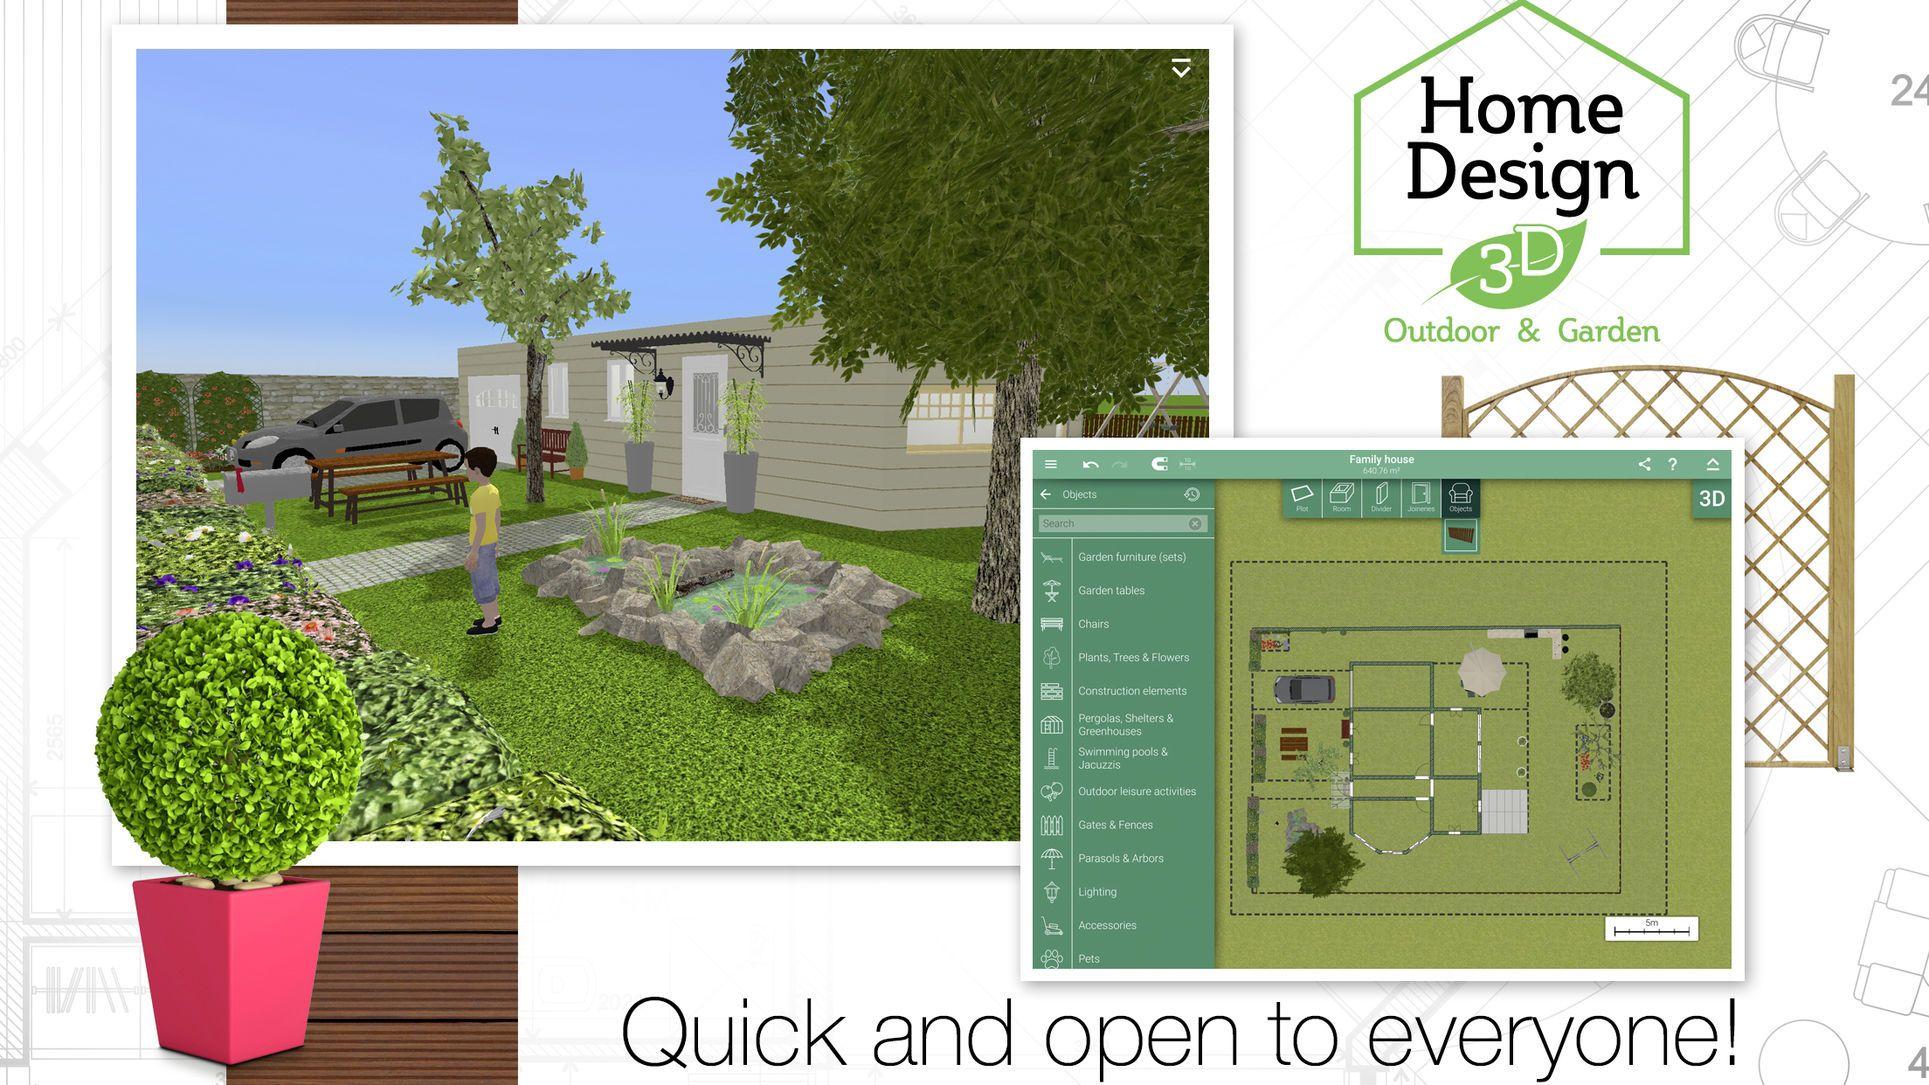 Home Design 3d Outdoor And Garden Lifestyle Productivity Apps Ios Landscape Design App Landscape Design Software Home Design Software